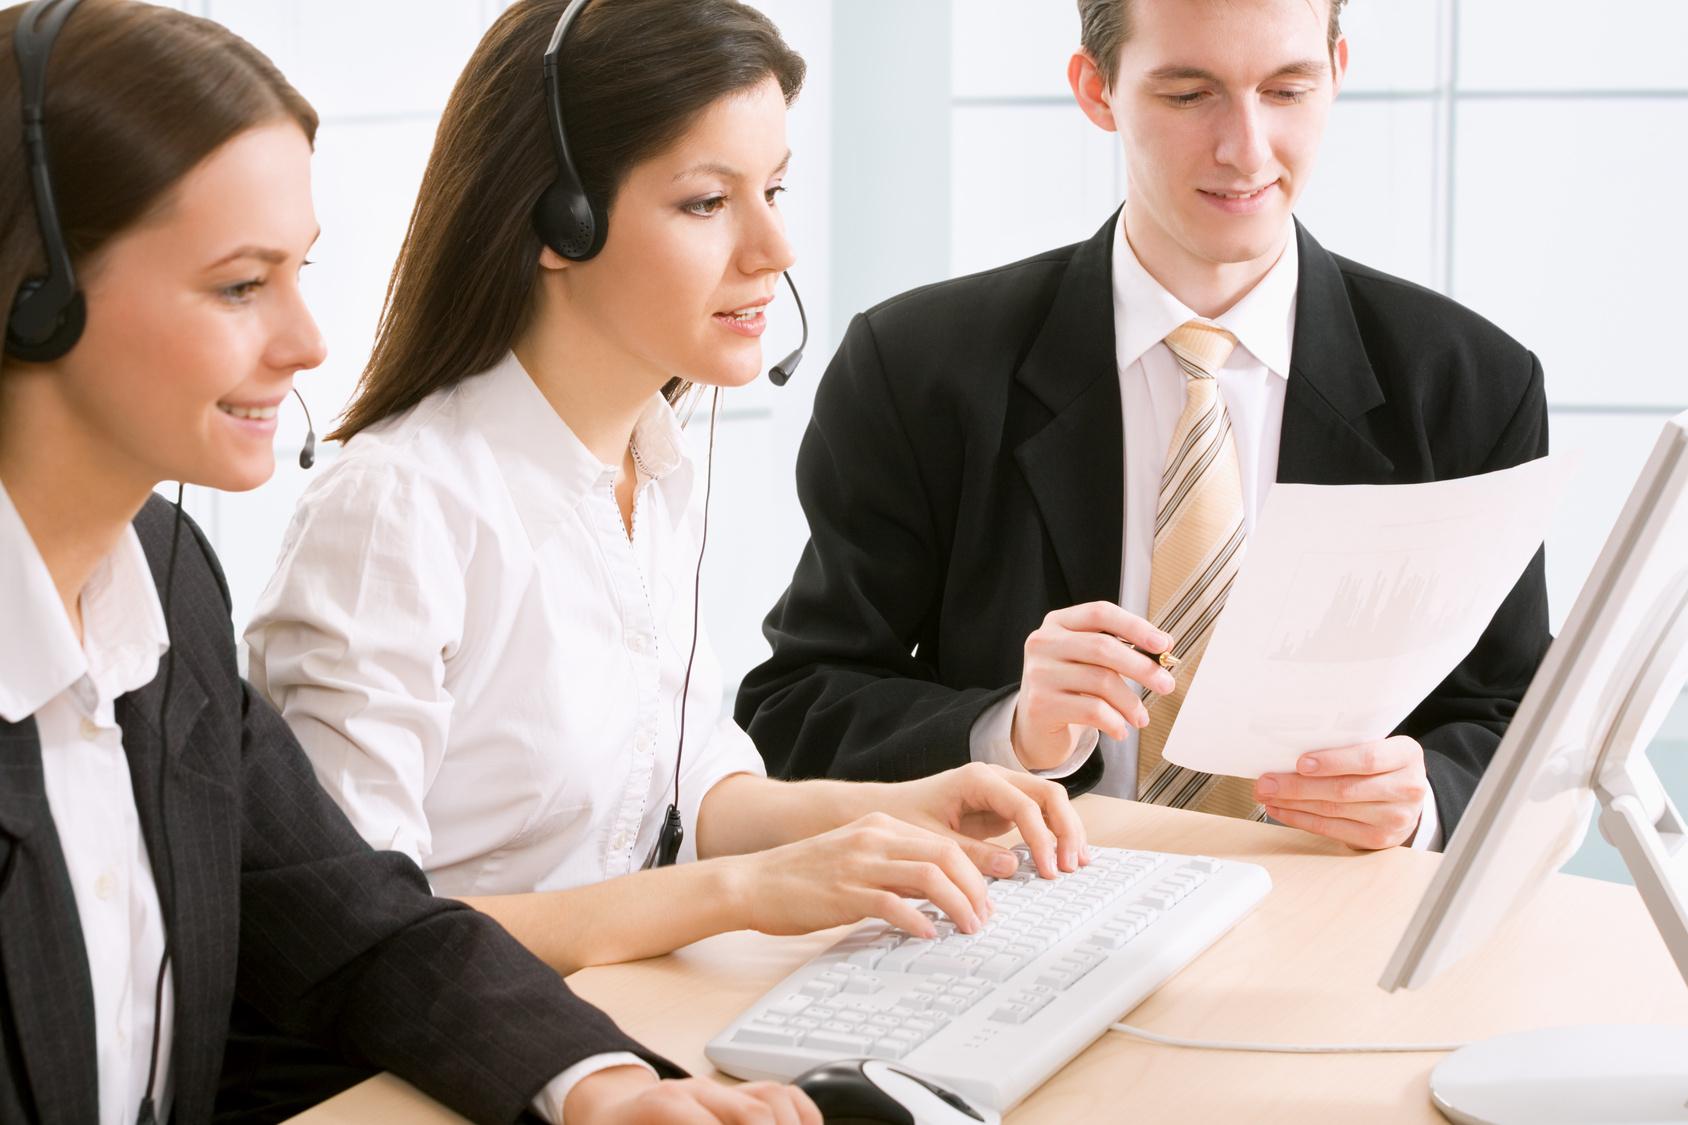 call center training tips